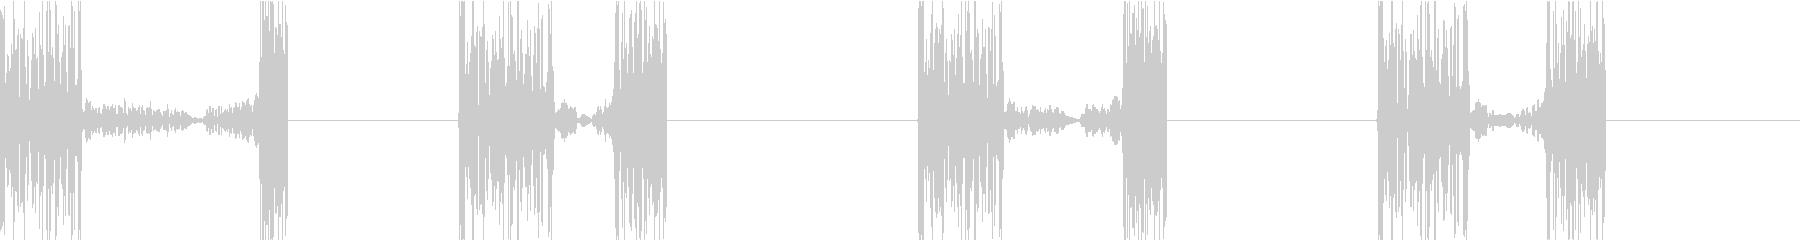 DJプレイ スクラッチ・ノイズ 171の未再生の波形